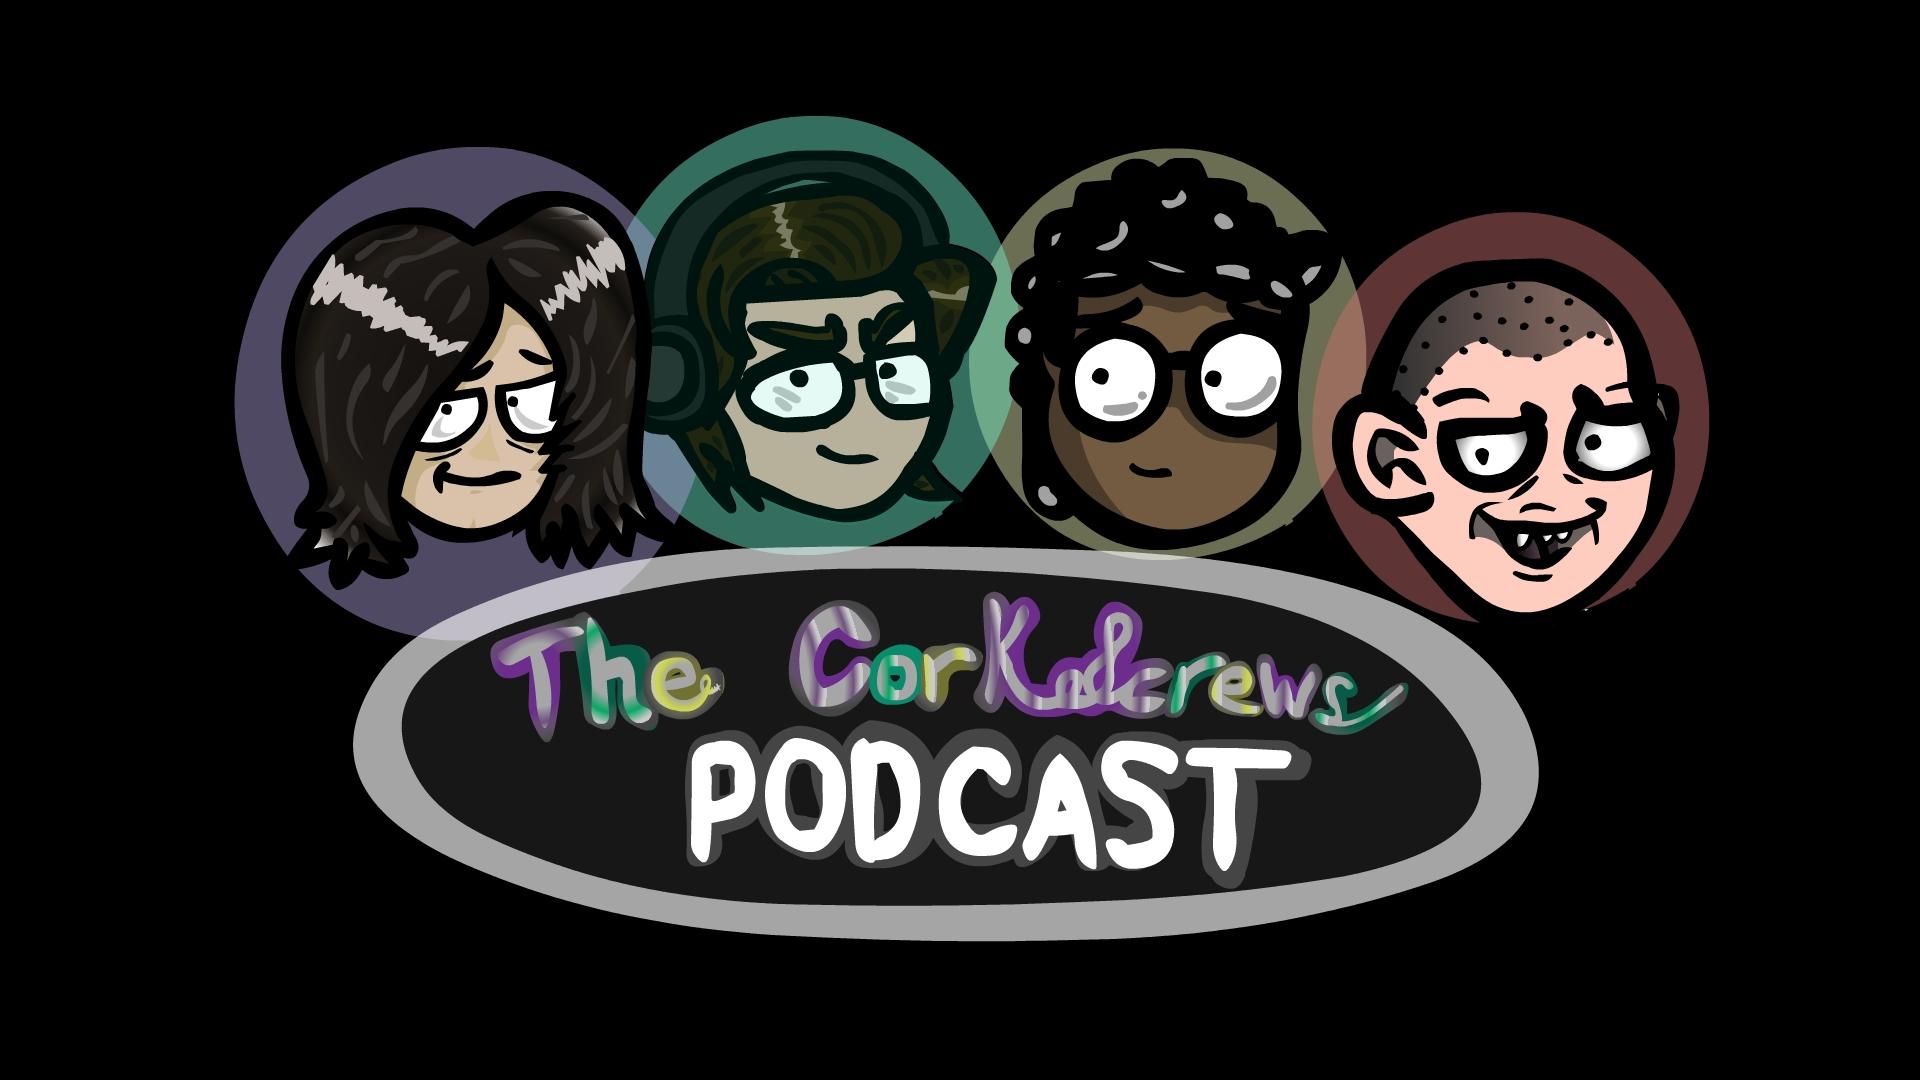 The Corkscrews Podcast: Official Art/Banner